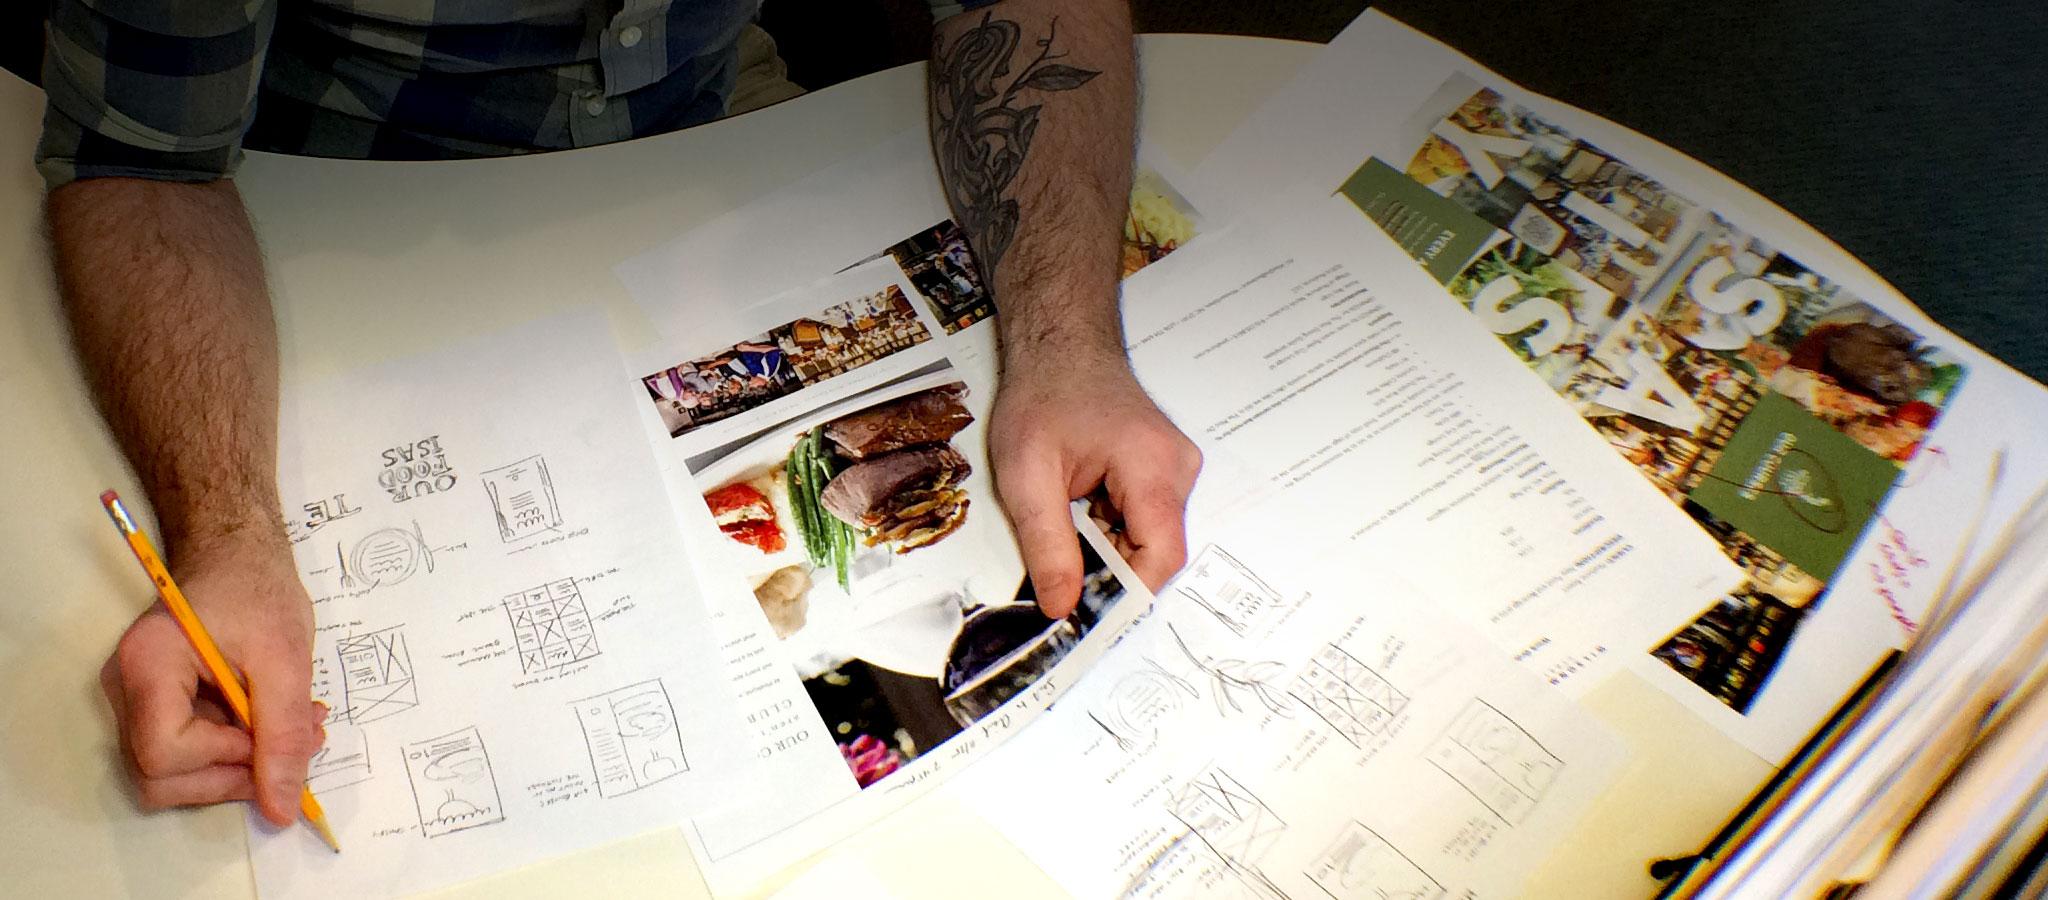 WilsonMcGuire creative Philip designing